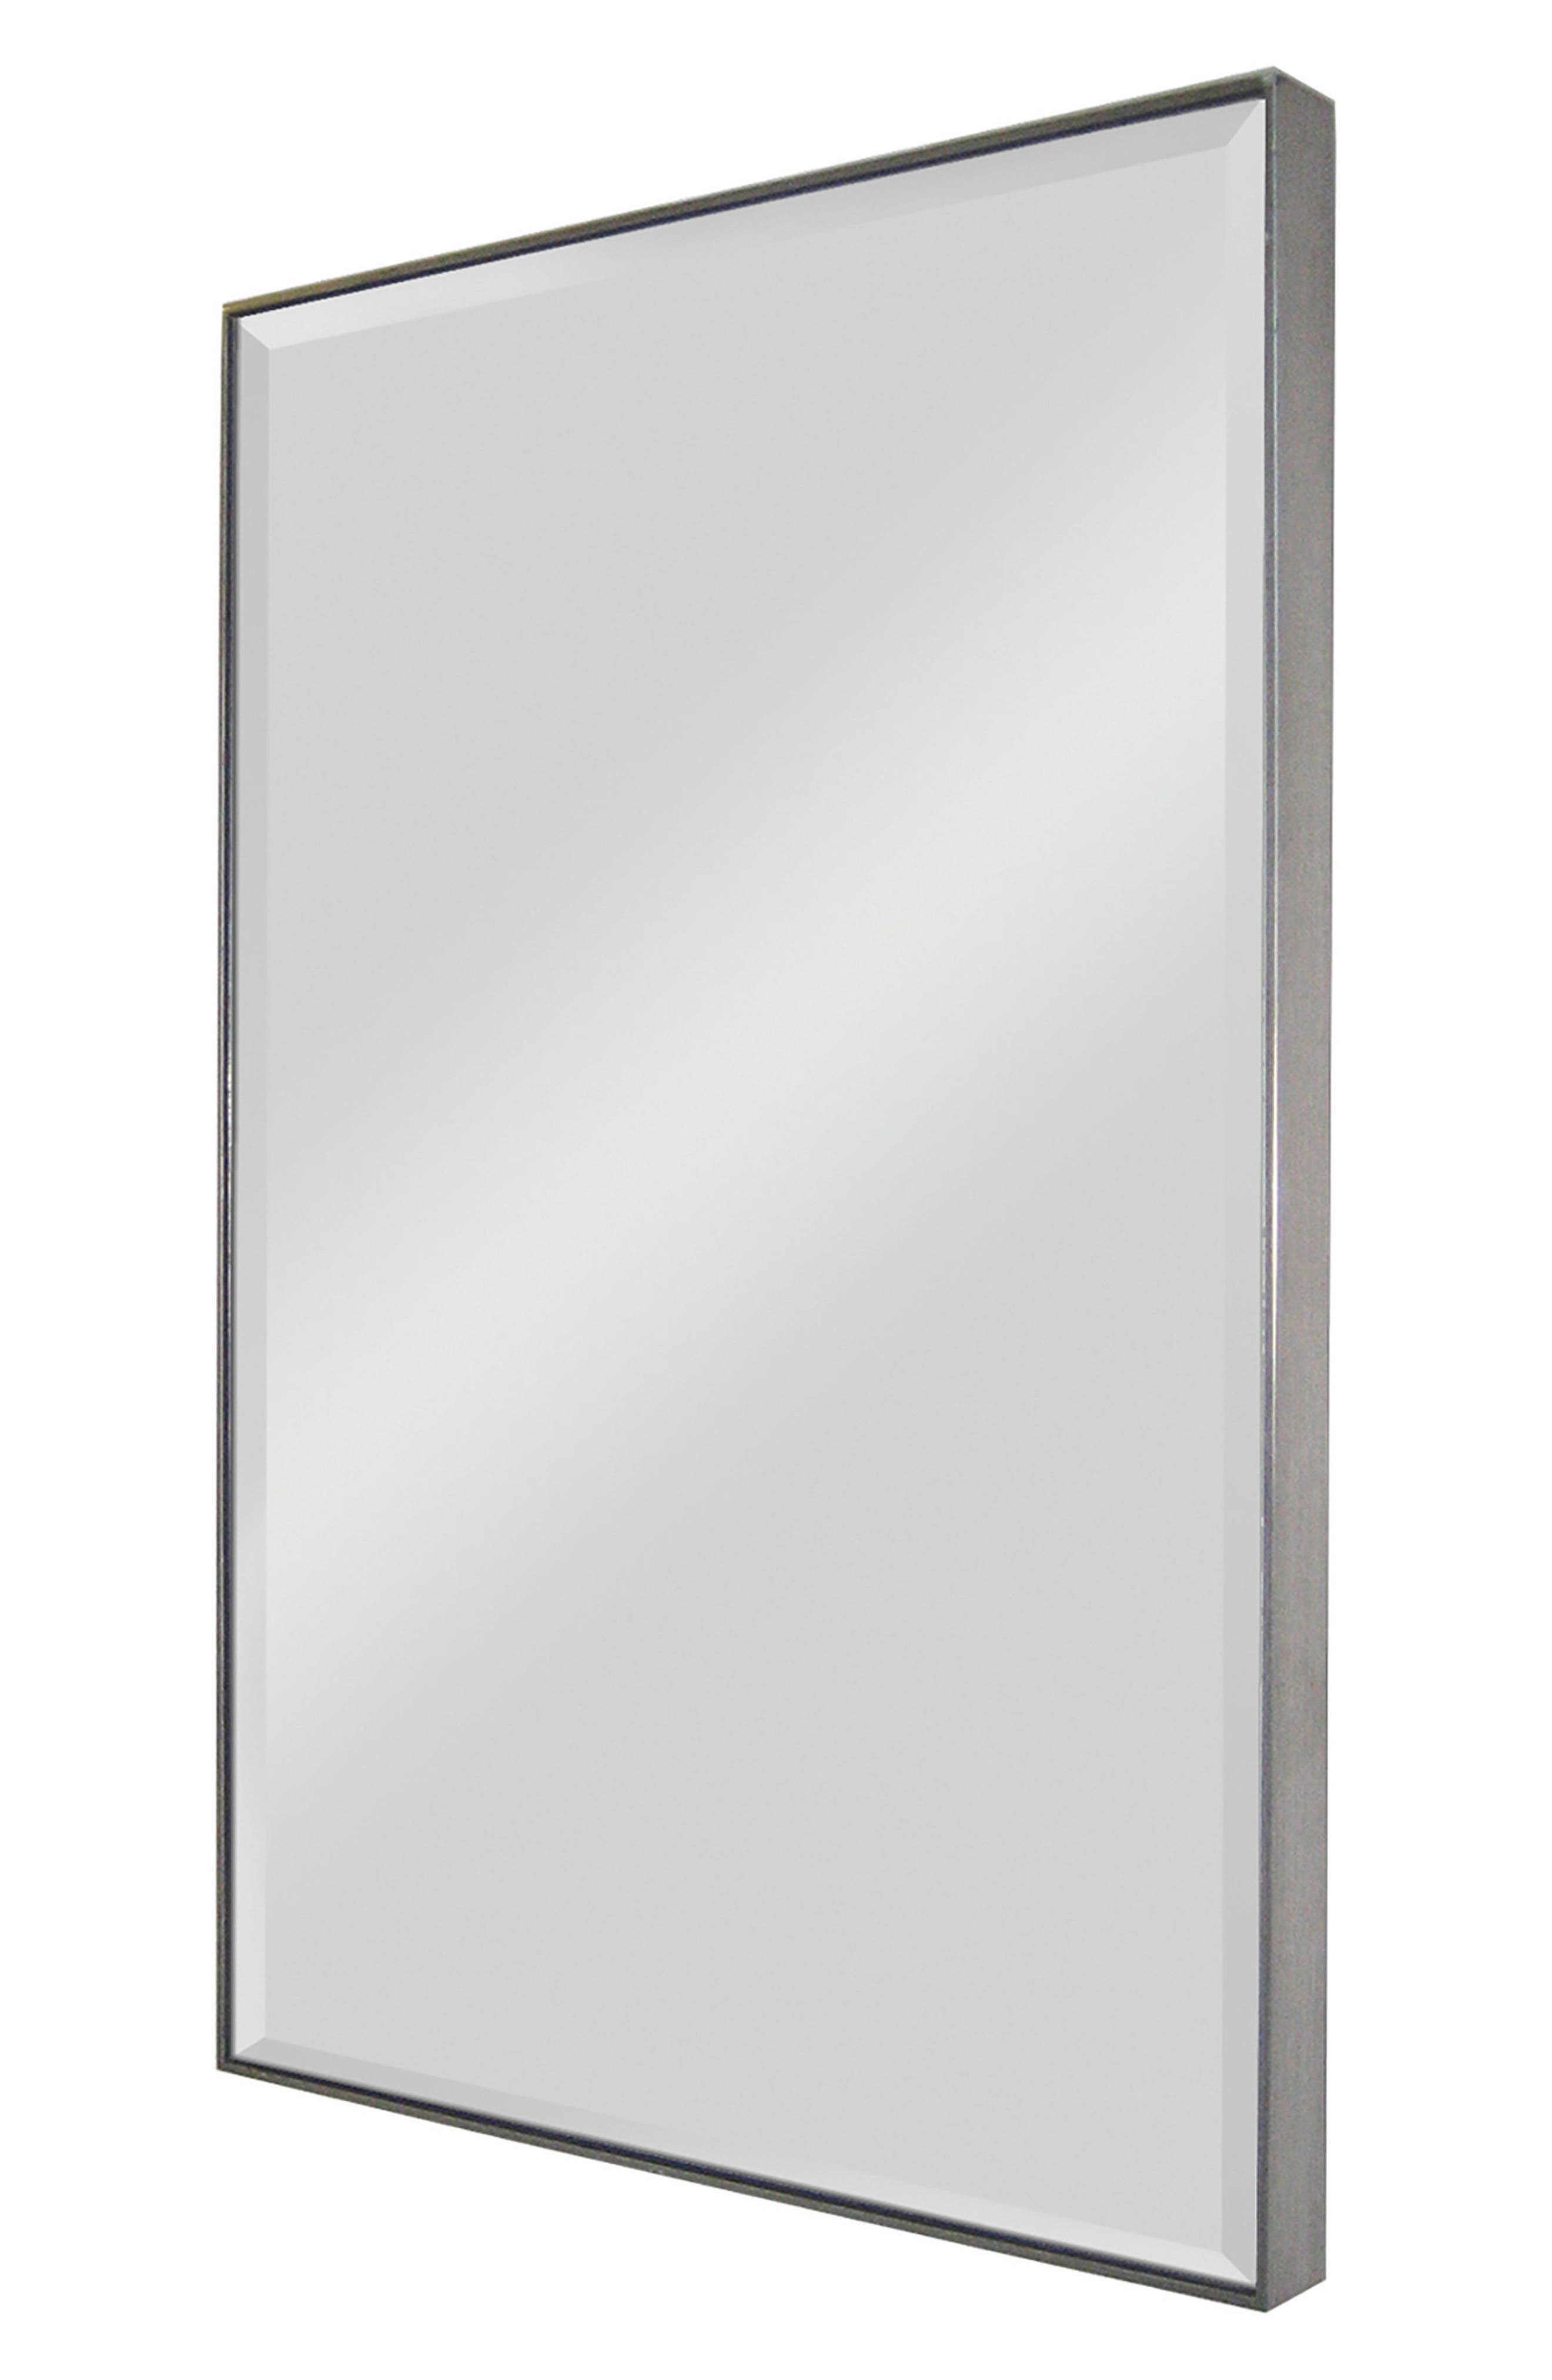 Main Image - Renwil Onis Mirror